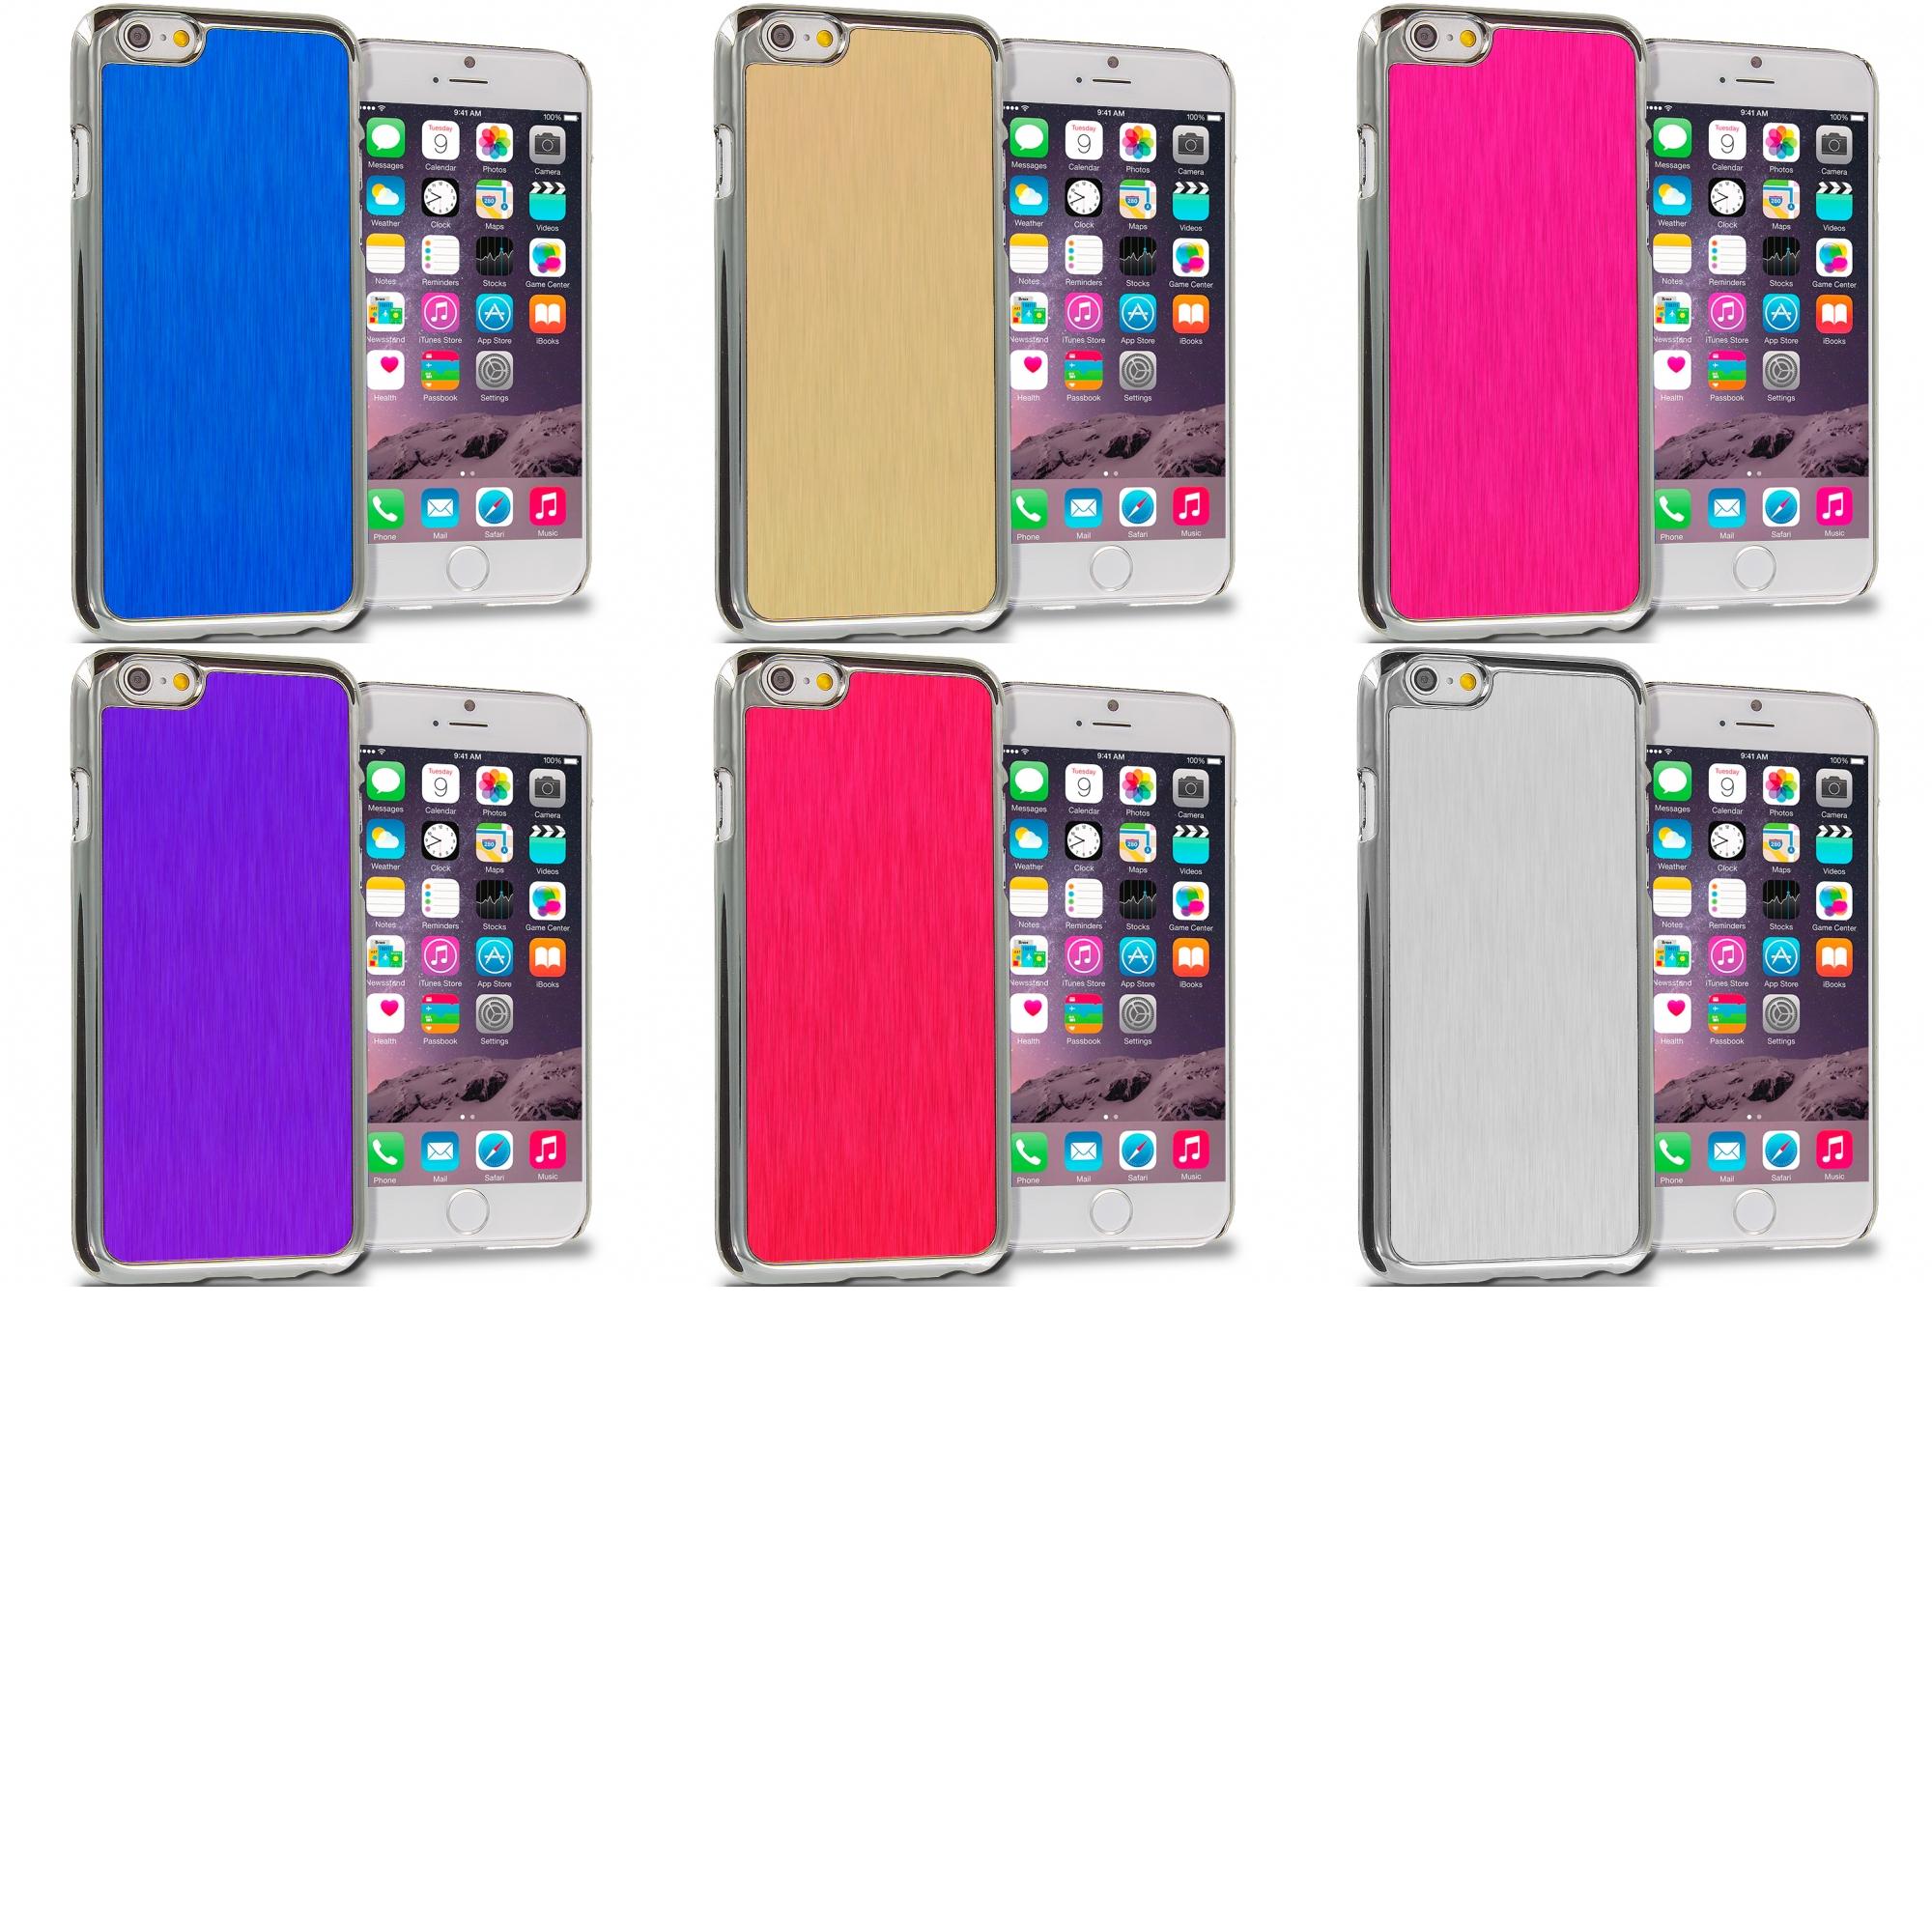 Apple iPhone 6 6S (4.7) 6 in 1 Combo Bundle Pack - Aluminum Metal Hard Case Cover